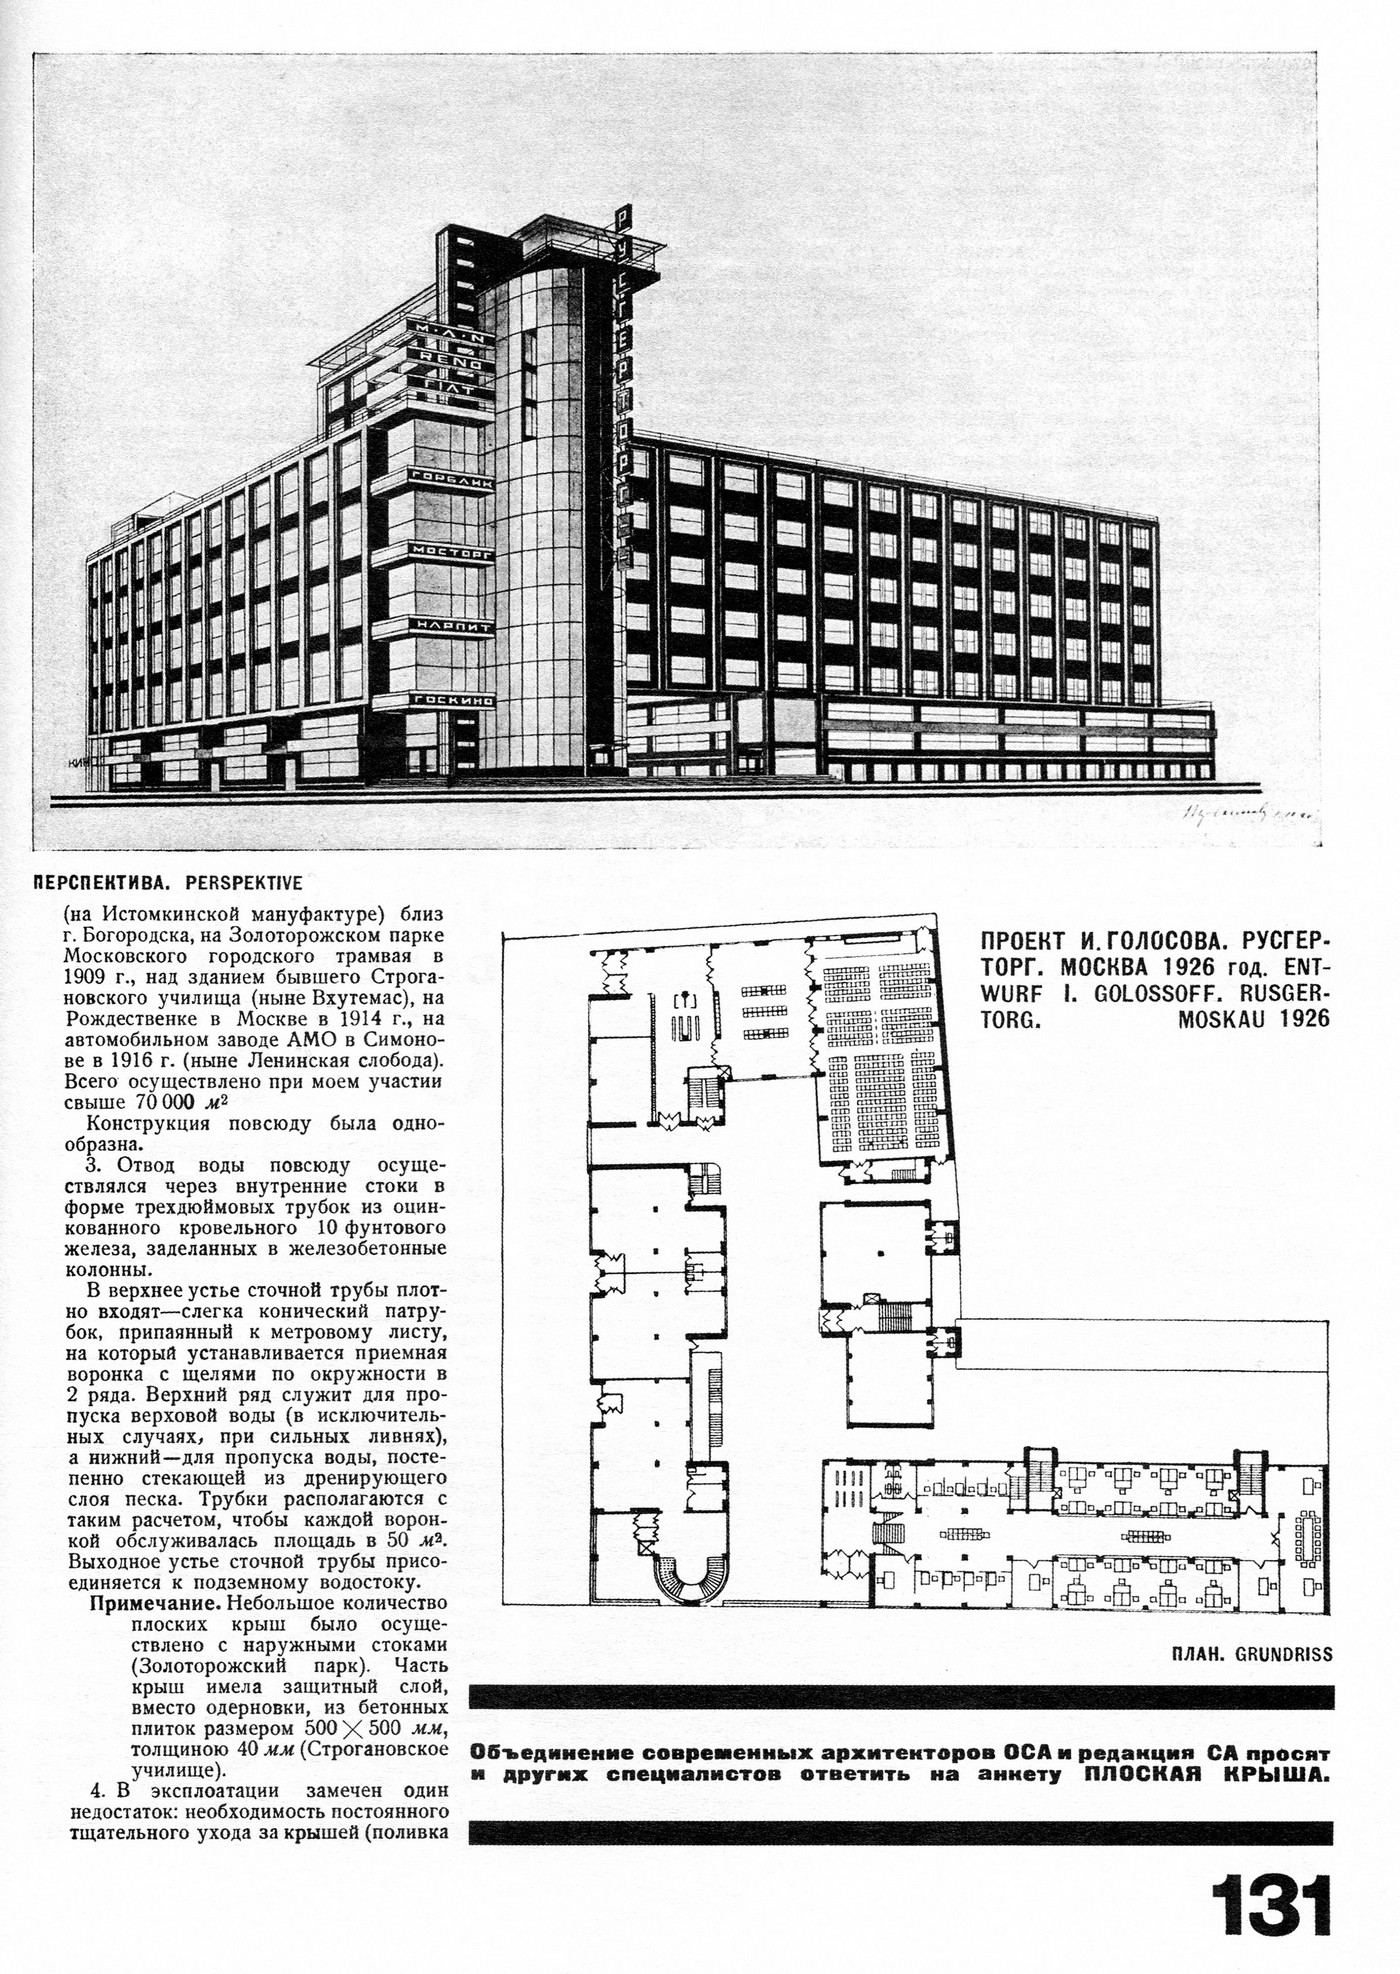 tehne.com-sa-1926-5-6-1400-0023